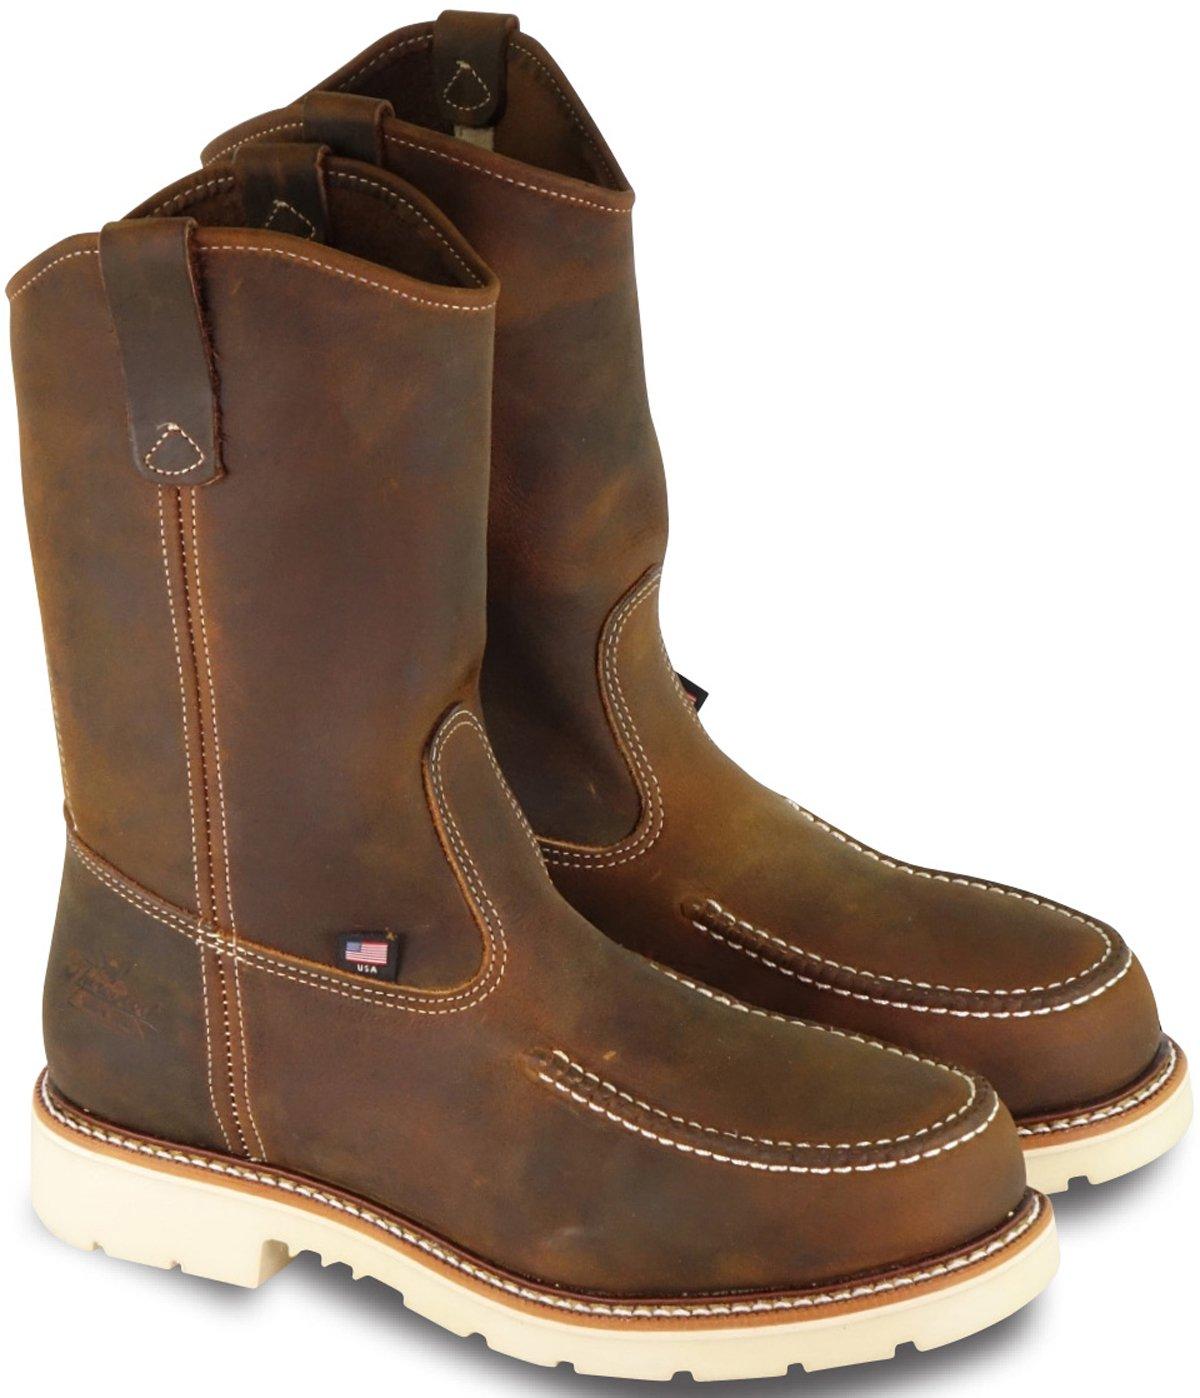 Thorogood 804-3311 Men's American Heritage 11'' Wellington Moc Toe, MAXwear 90 Safety Toe Boot, Trail Crazyhorse - 9 D(M) US